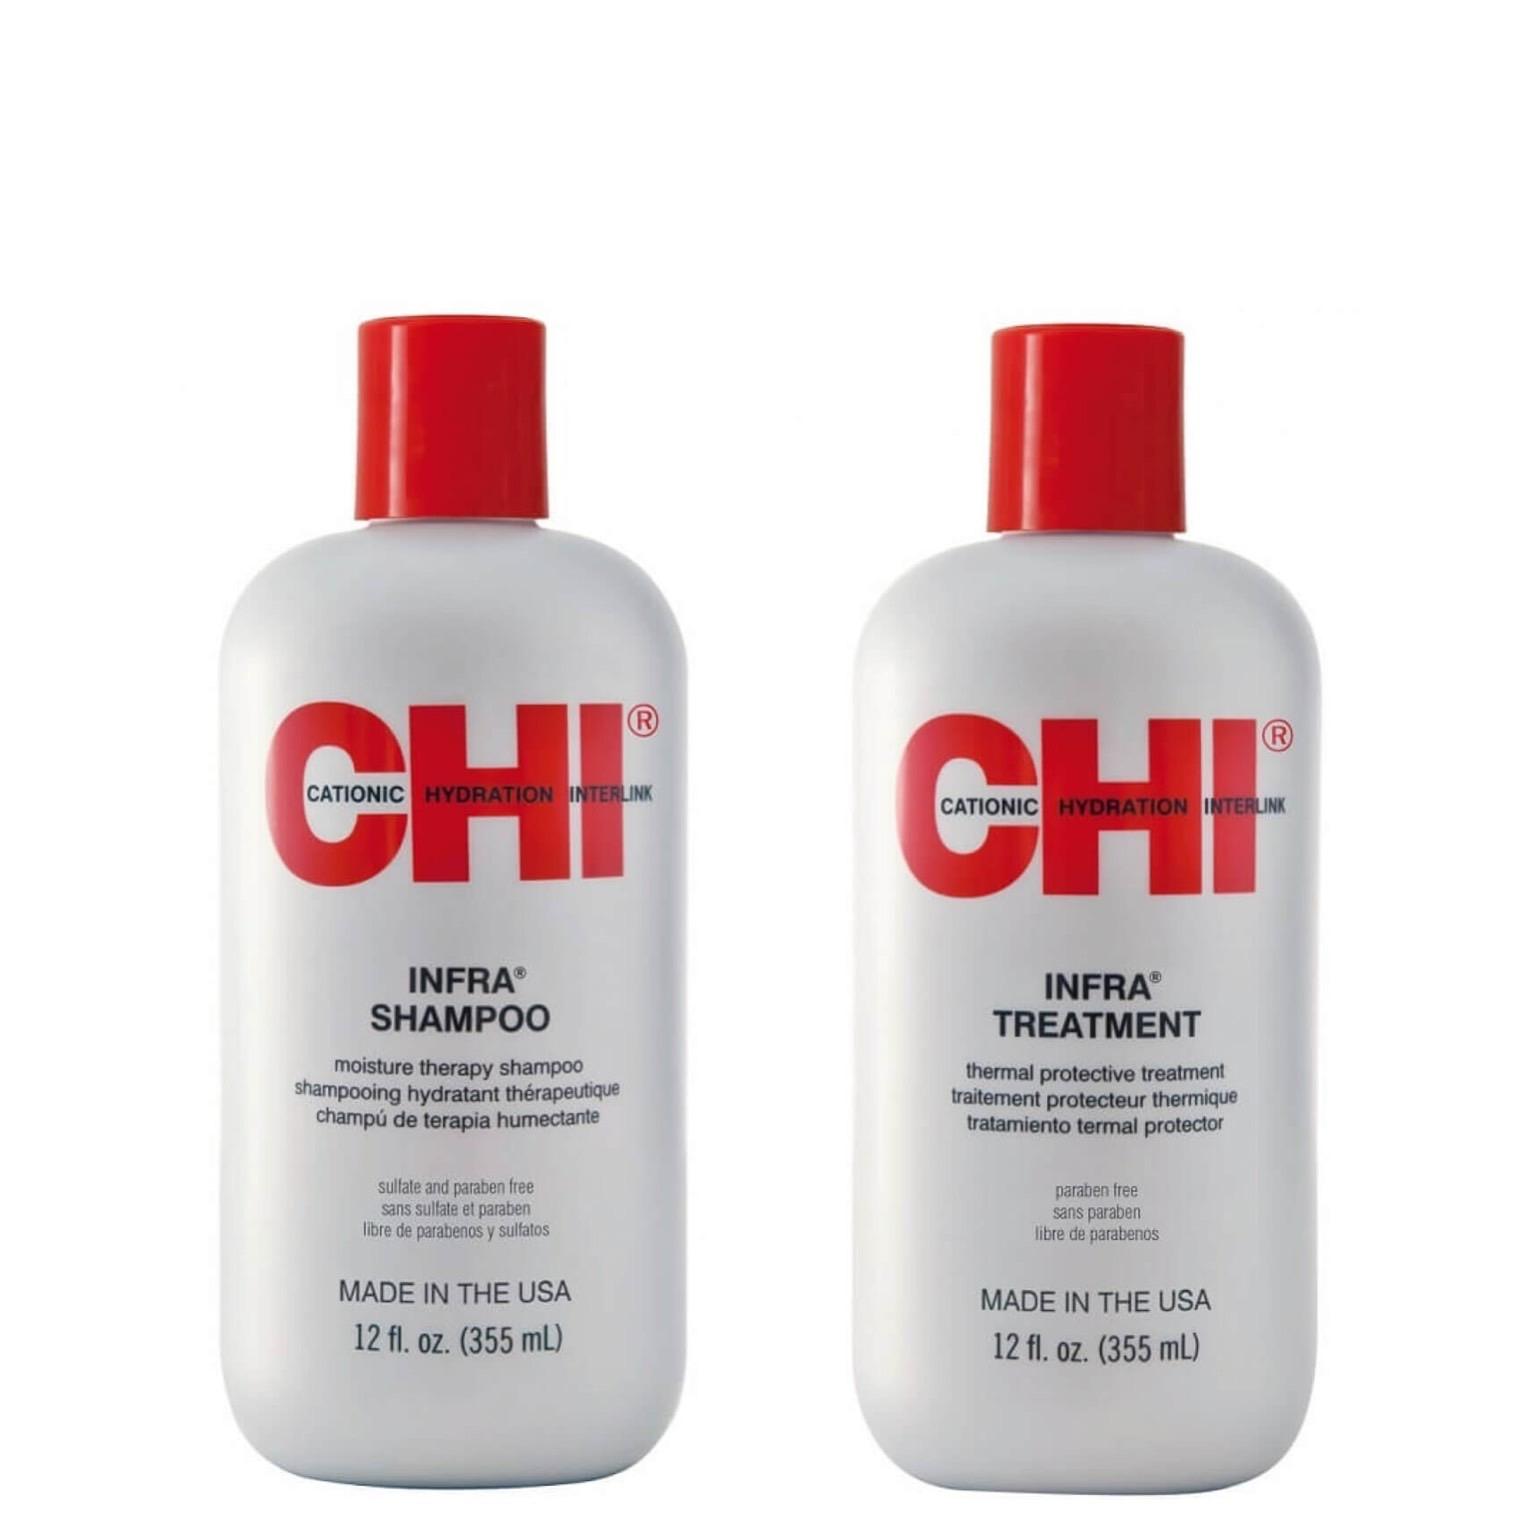 CHI Infra Set - Infra Shampoo 355ml + Infra Treatment 355ml